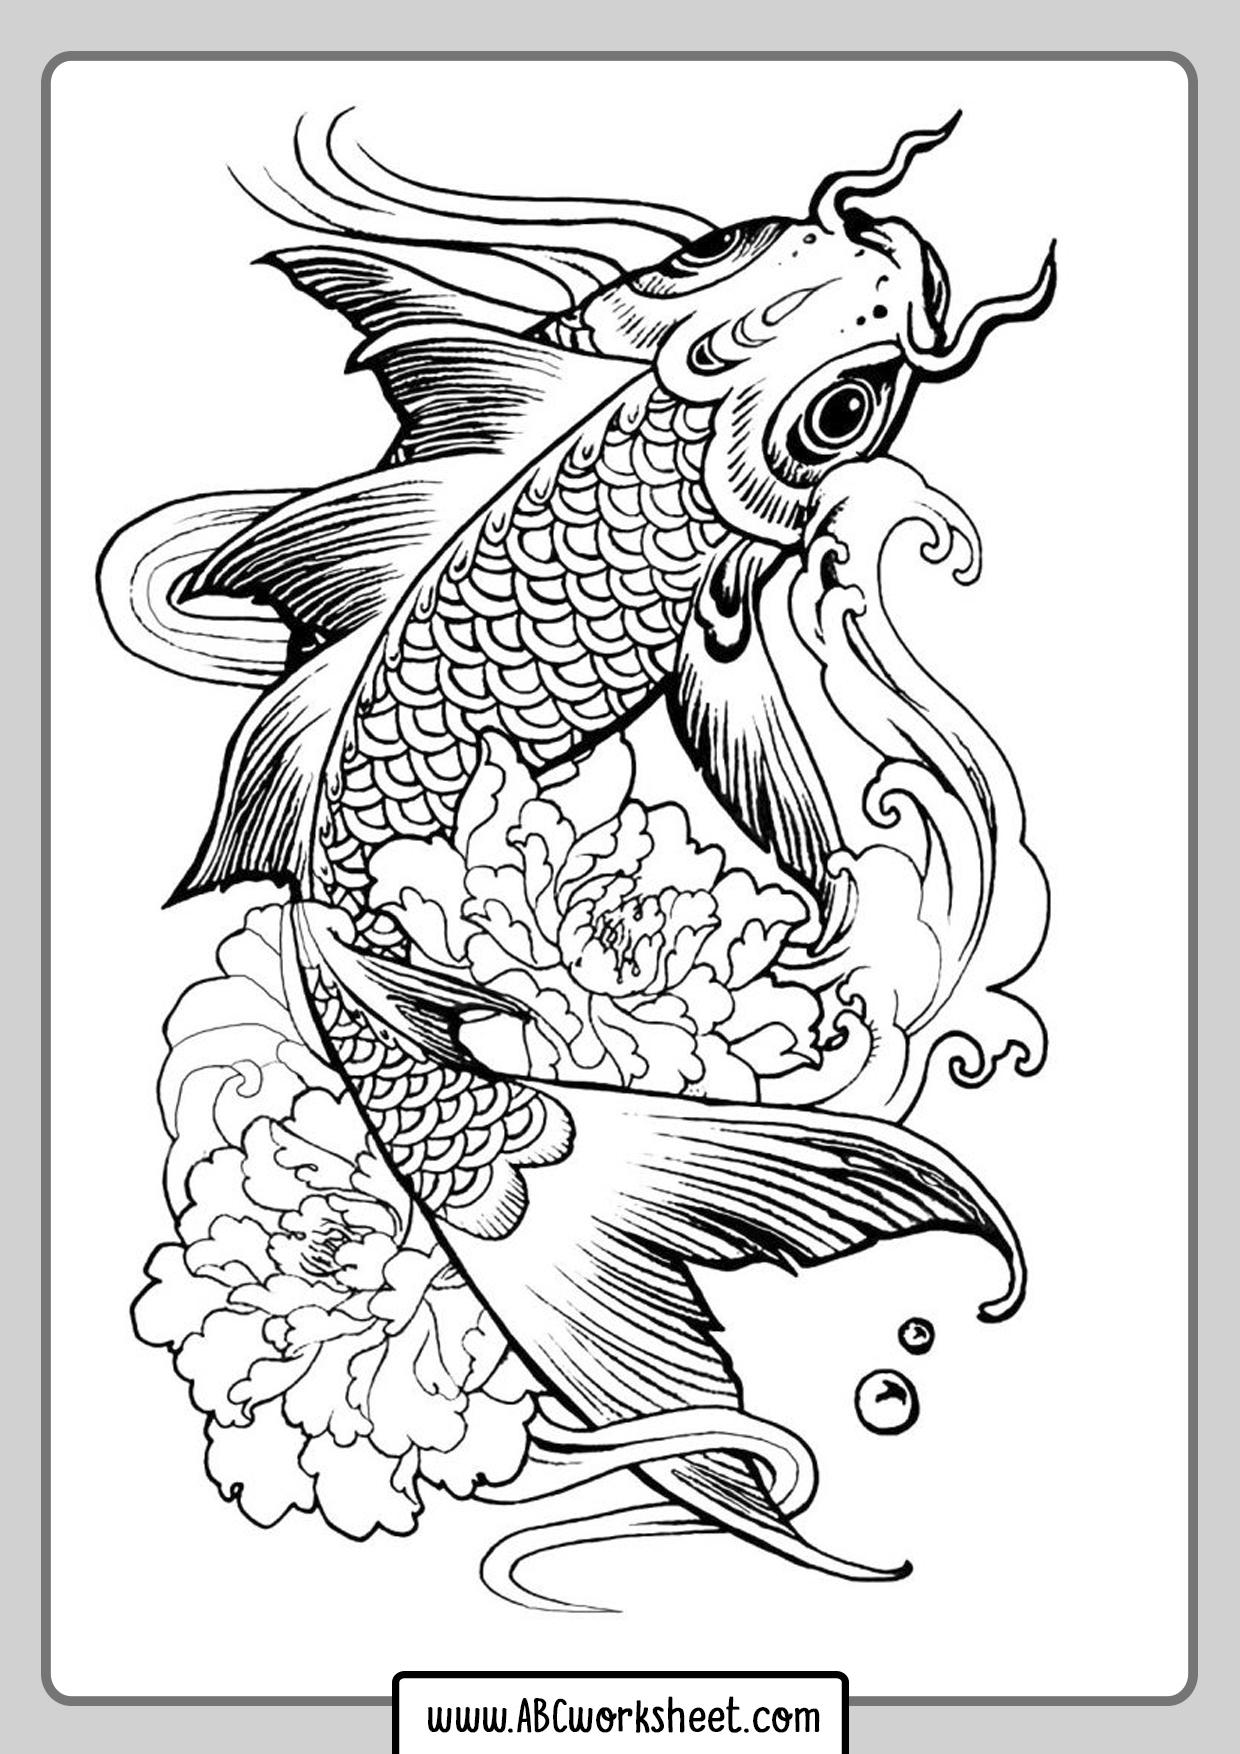 Carp Fish For Coloring